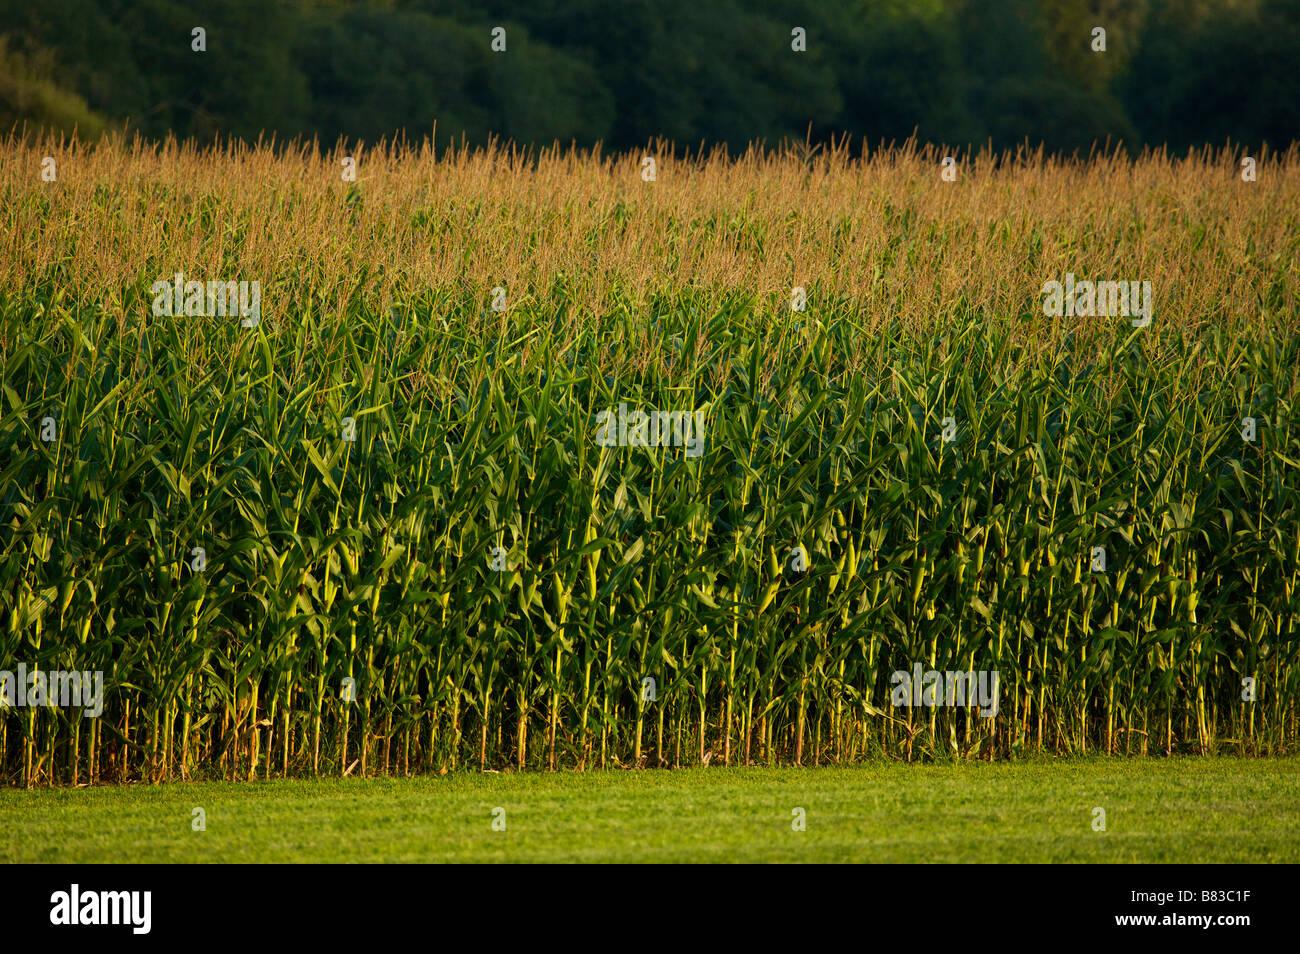 Corn fiel in Landes France - Stock Image